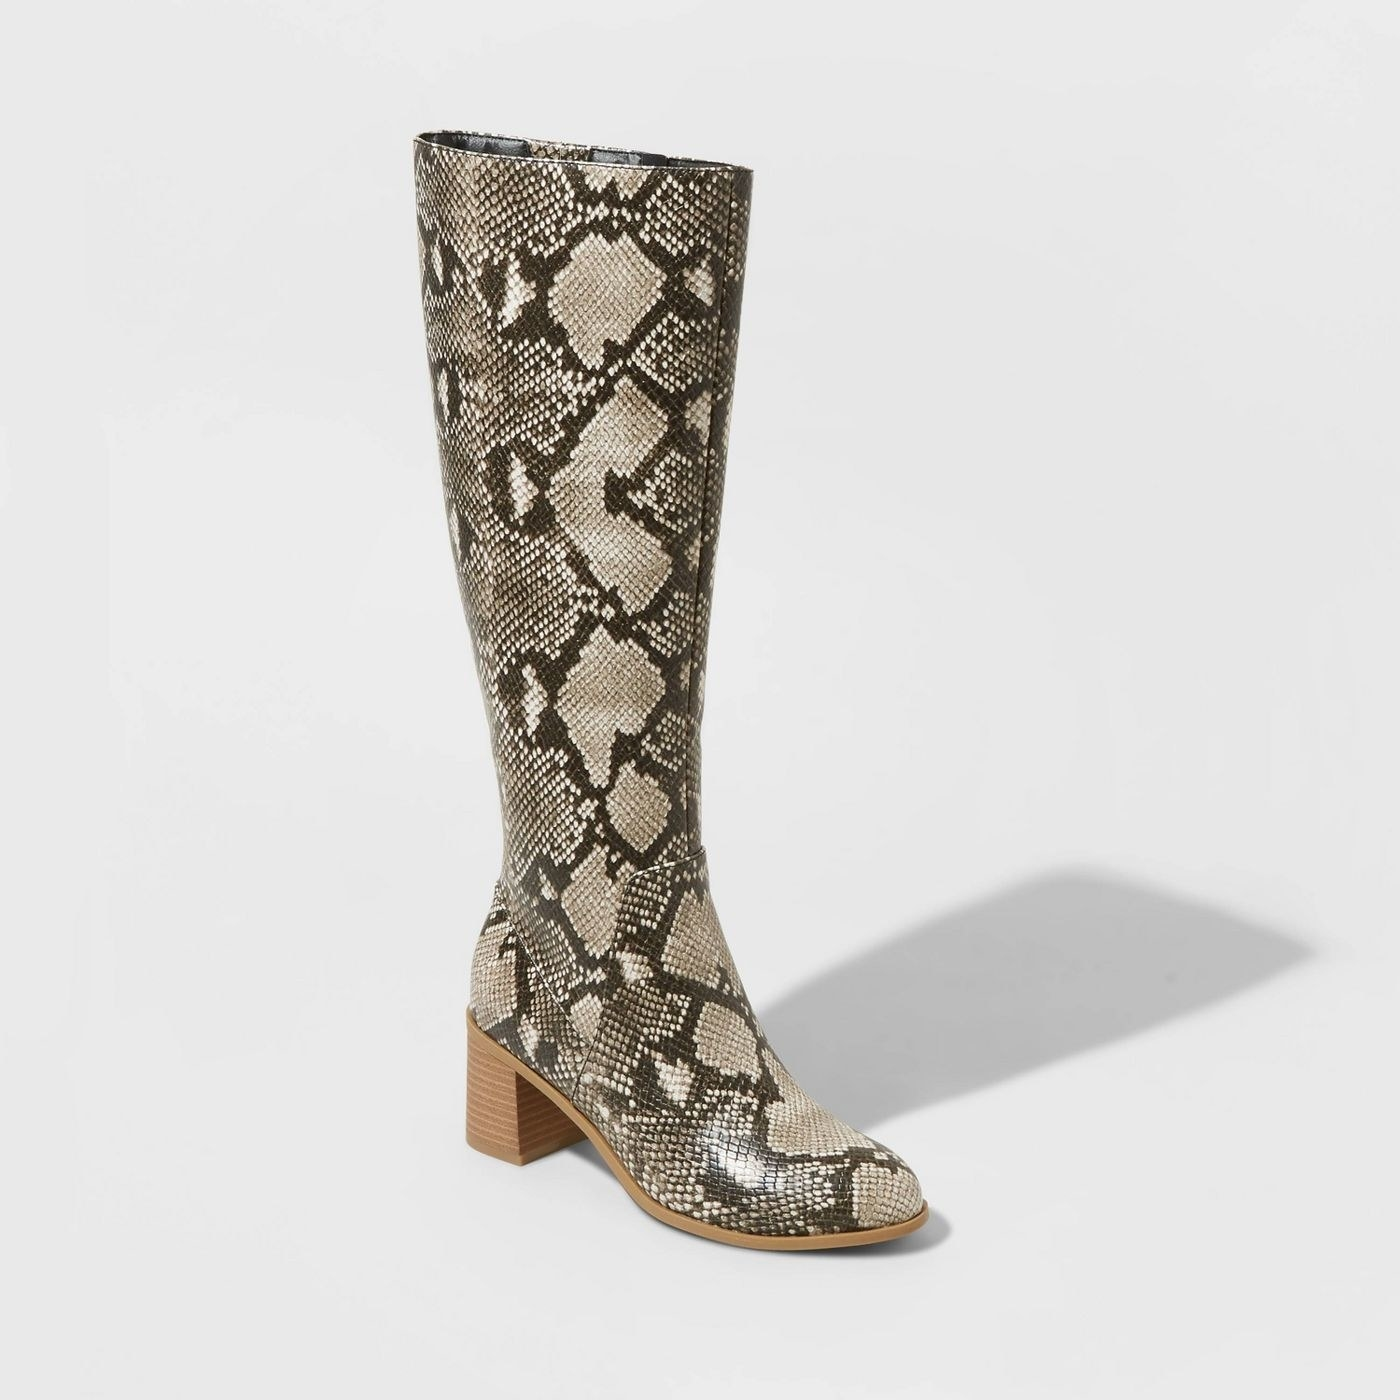 Snakeskin knee high heeled boots